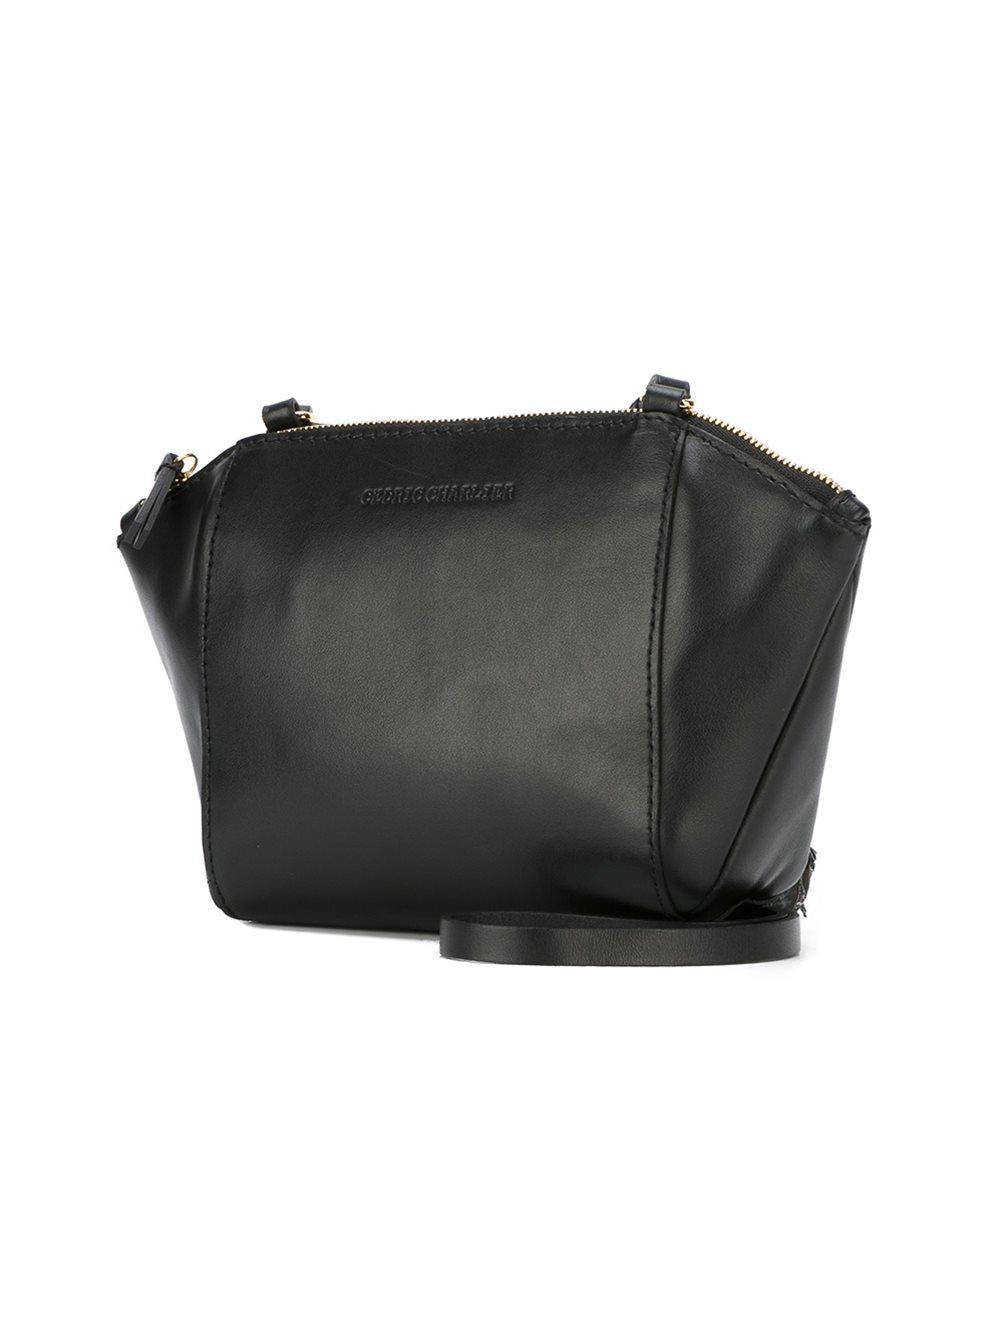 Cedric Charlier Structured Crossbody Bag In Black Lyst